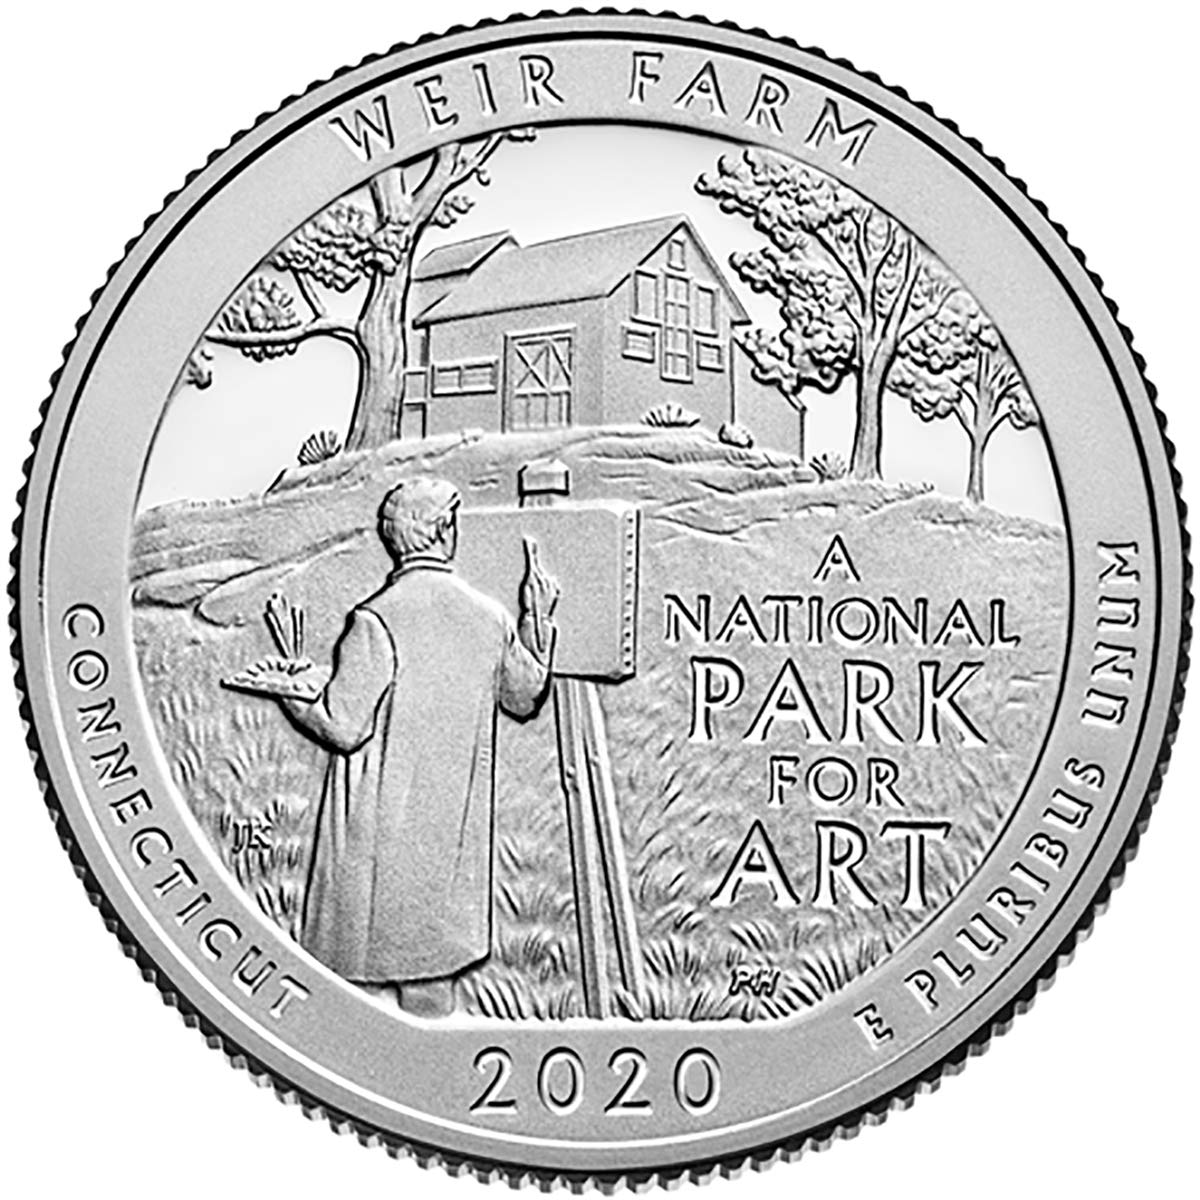 2 Coin Set Uncirculated D Weir Farm National Historic Site Quarter Singles 2020 P